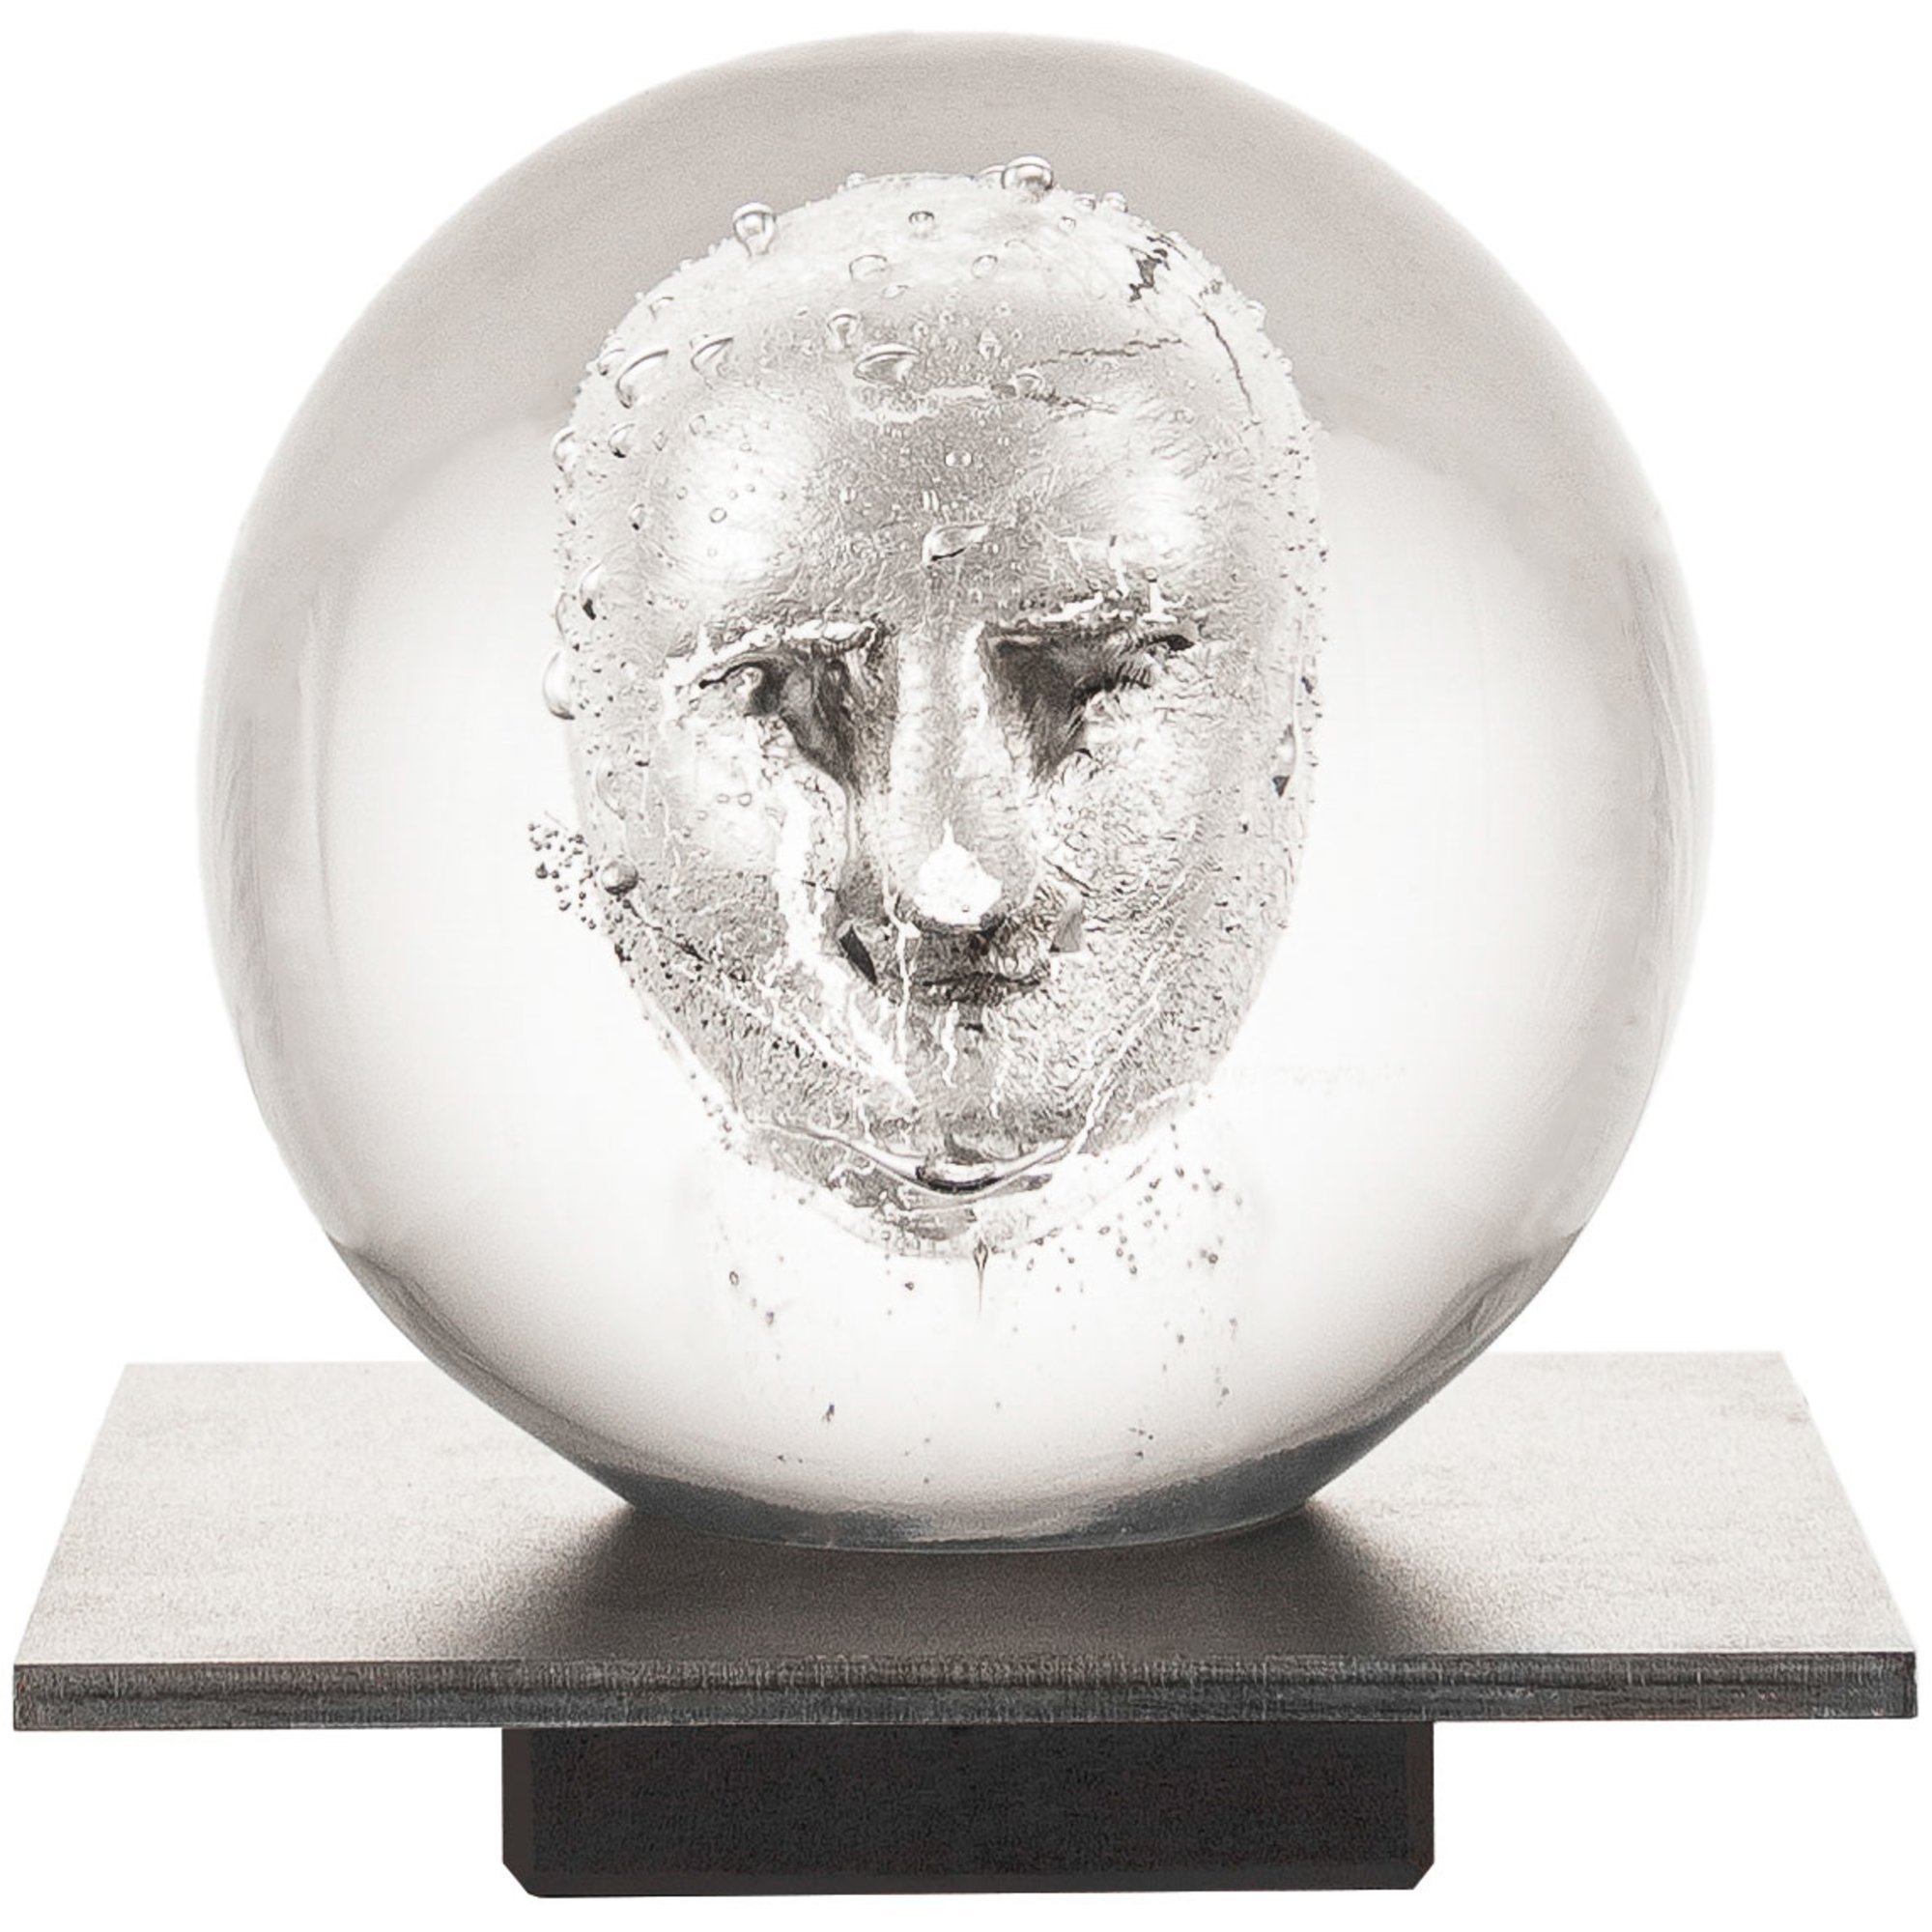 Kosta Boda Headman Skulptur 12 cm. Klar